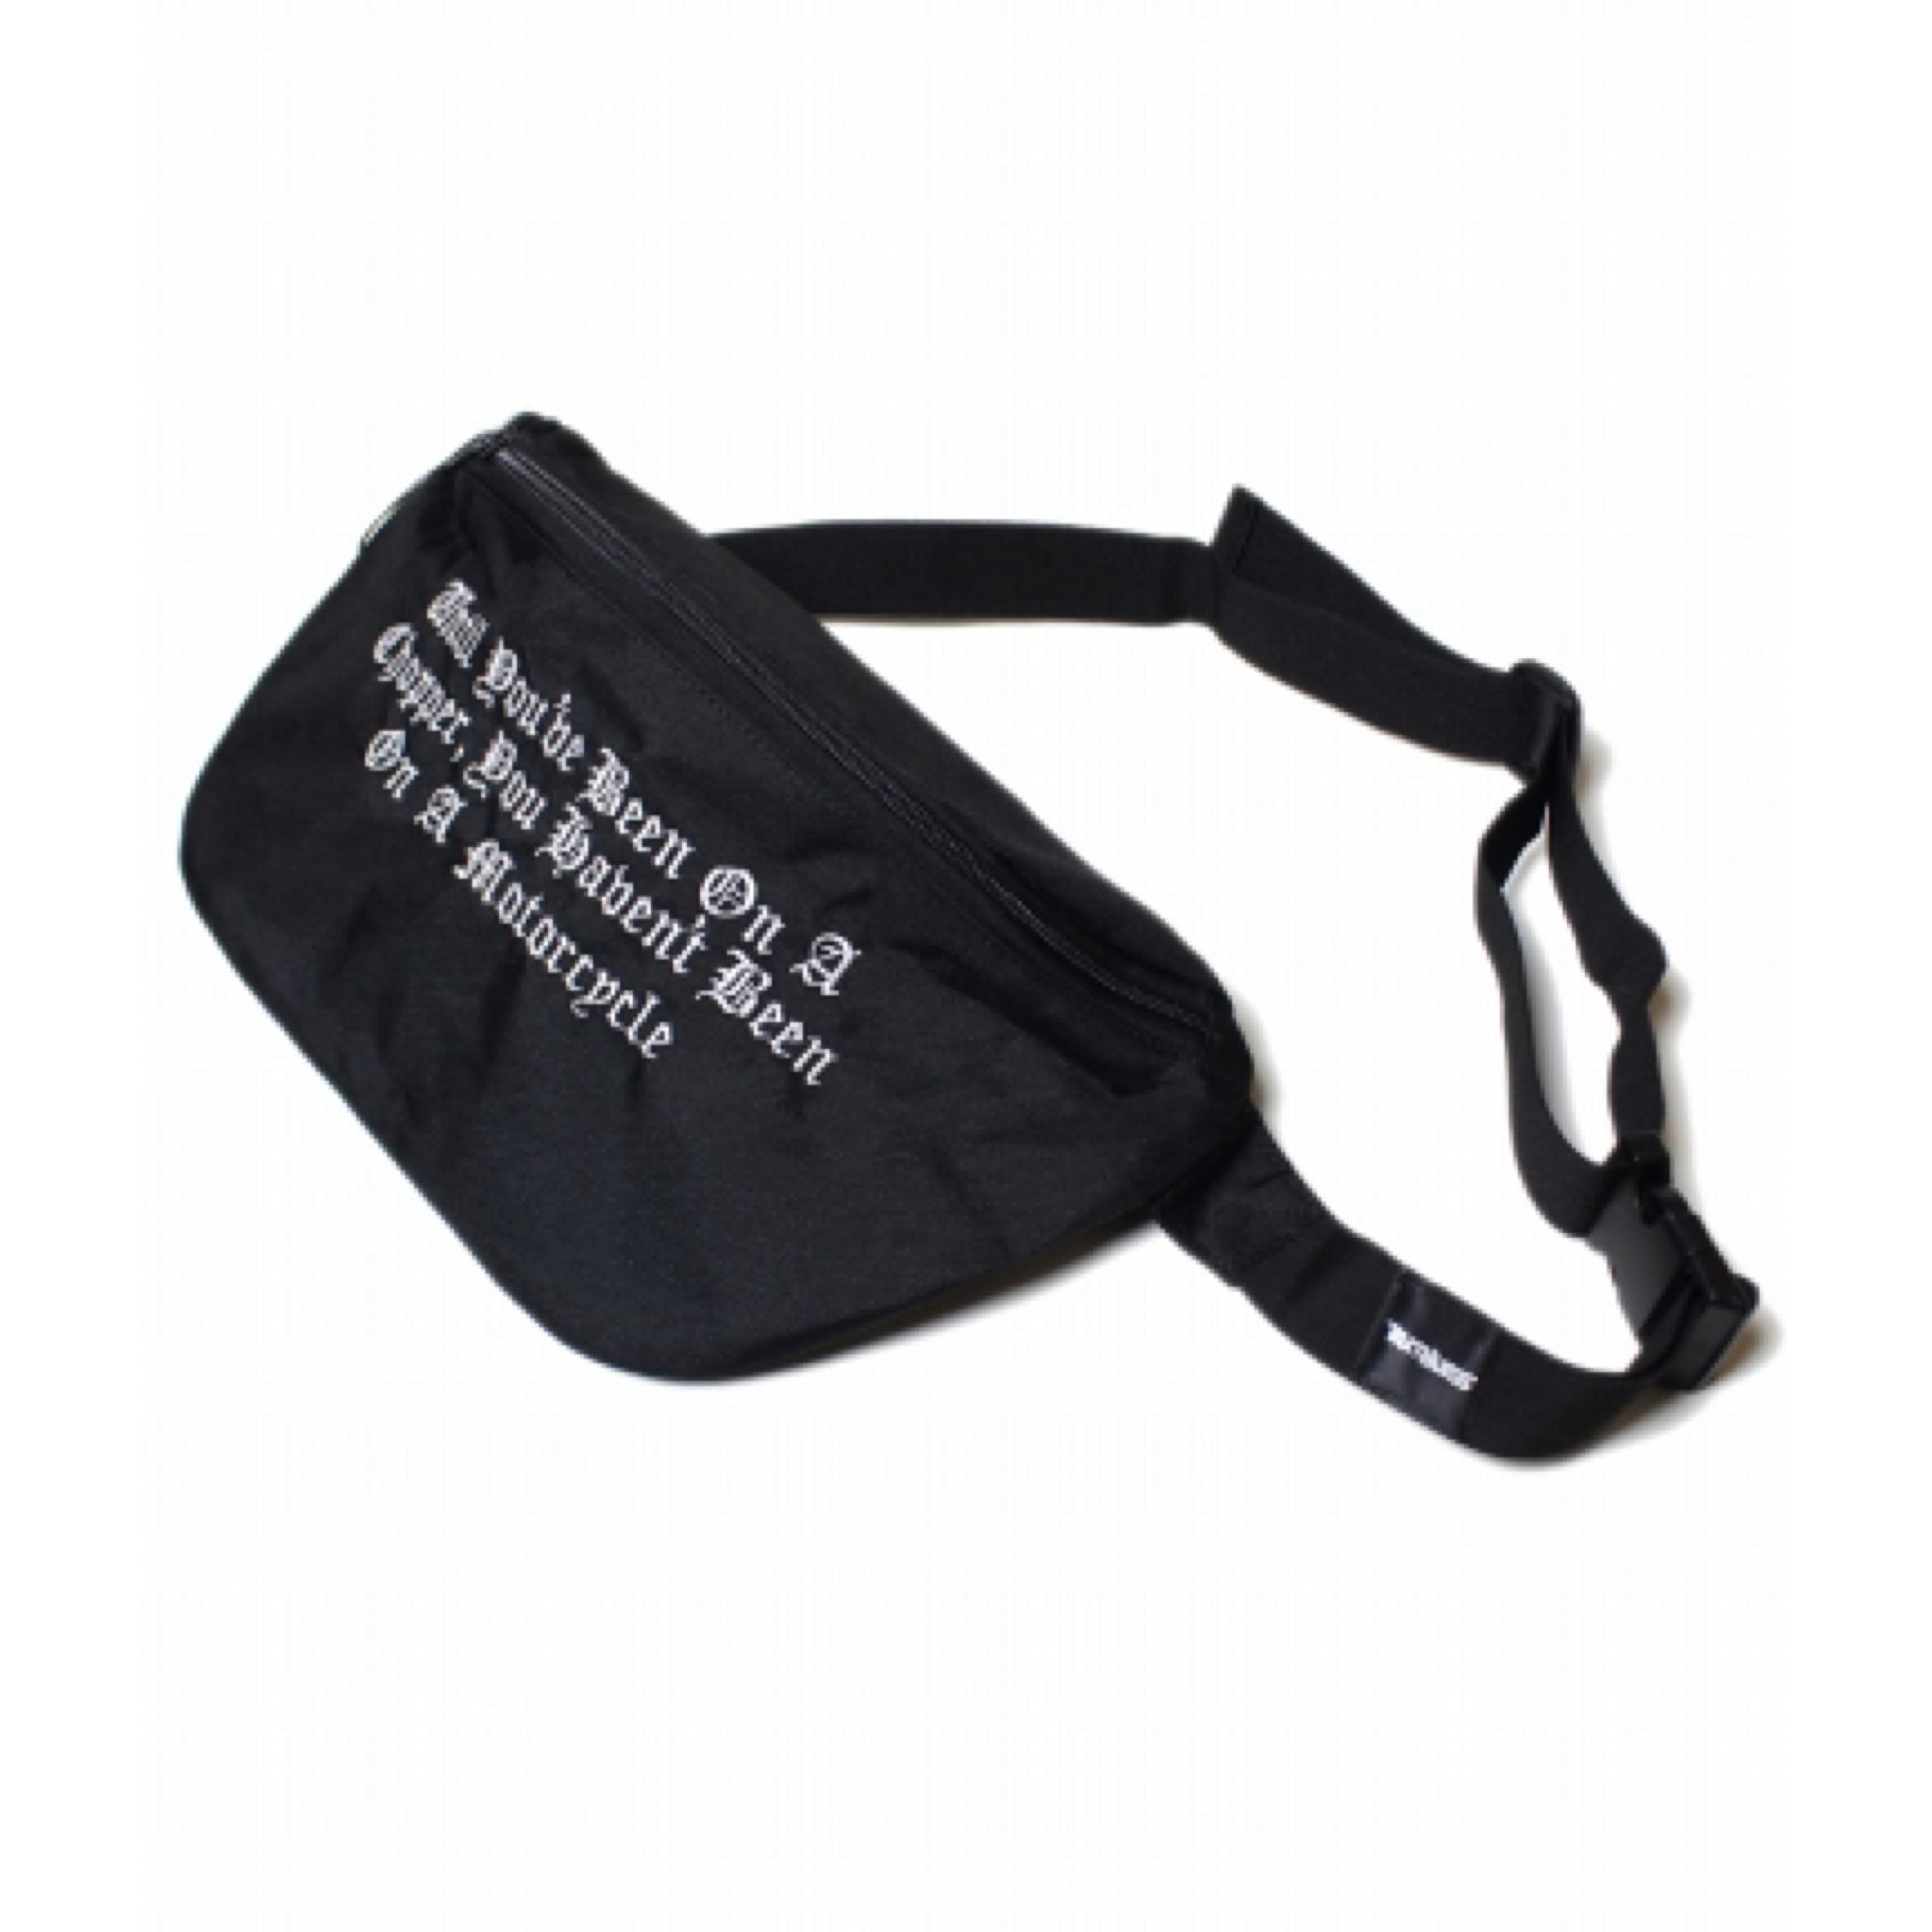 RUTHLESS #On A Chopper Body Bag Black